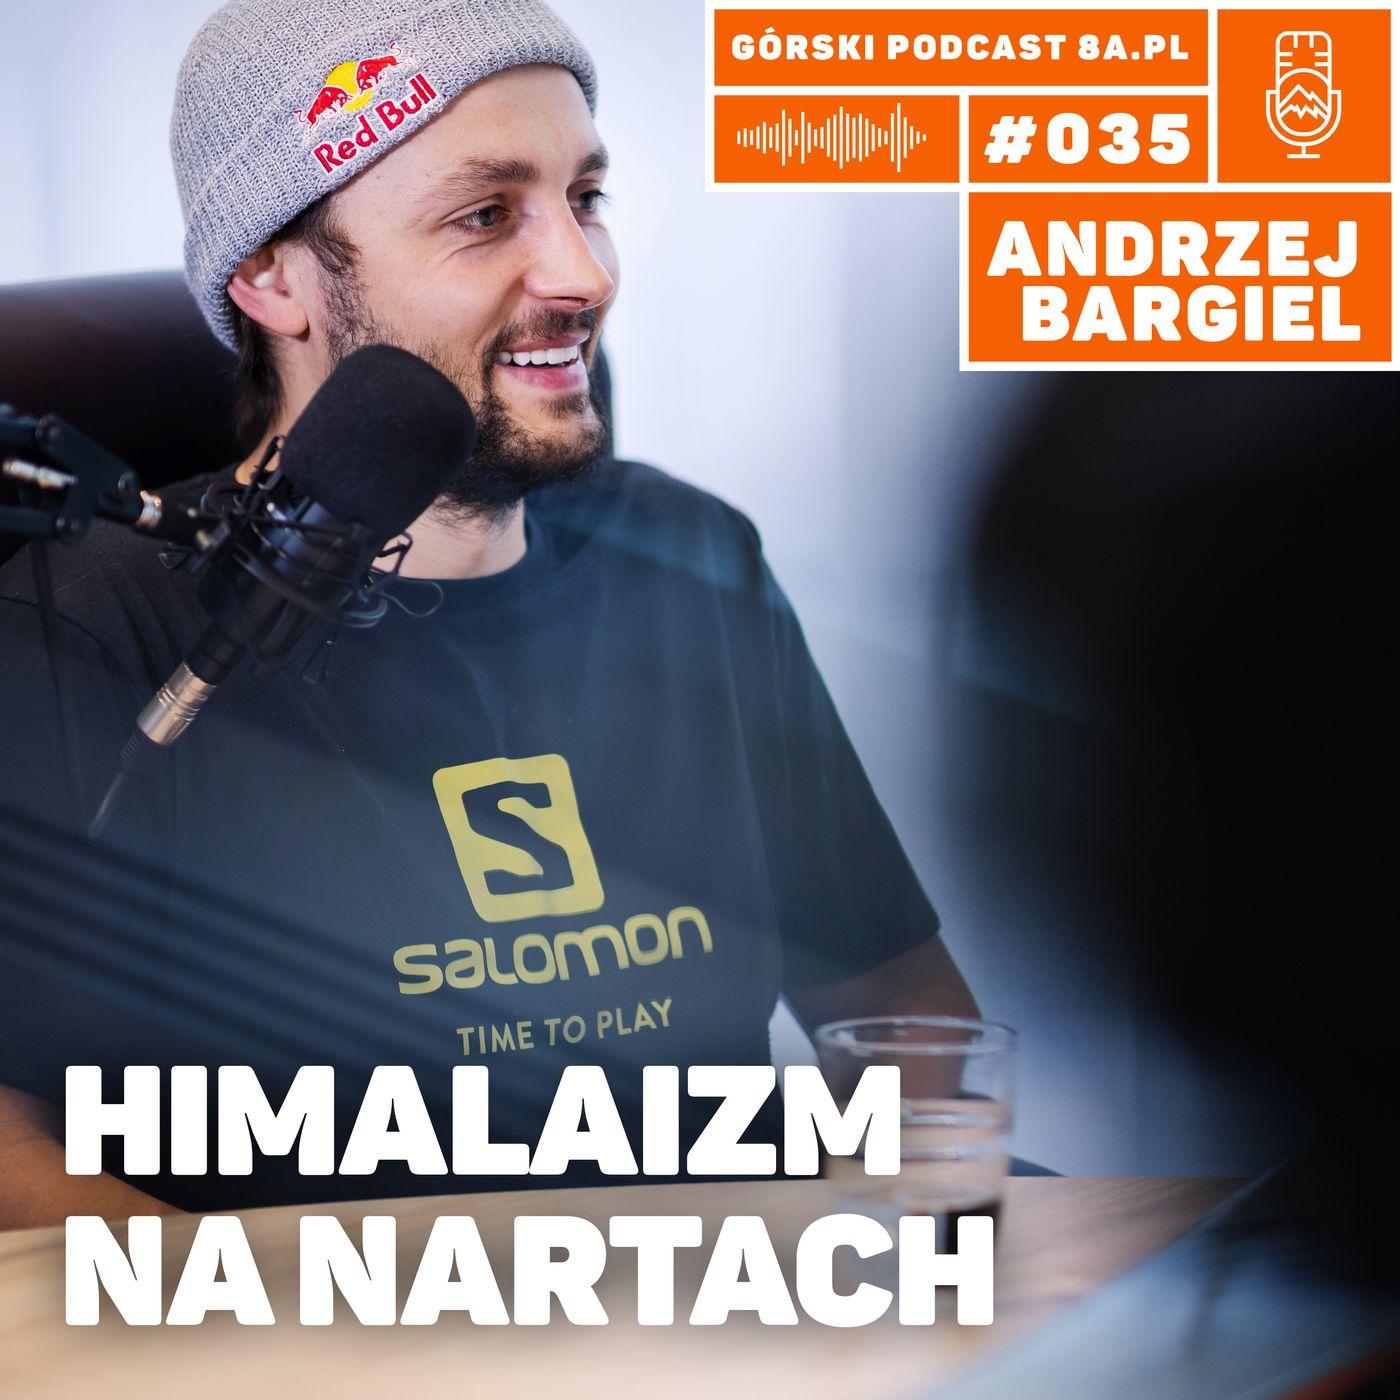 #035 8a.pl - Andrzej Bargiel - Salomon. Himalaizm na nartach.